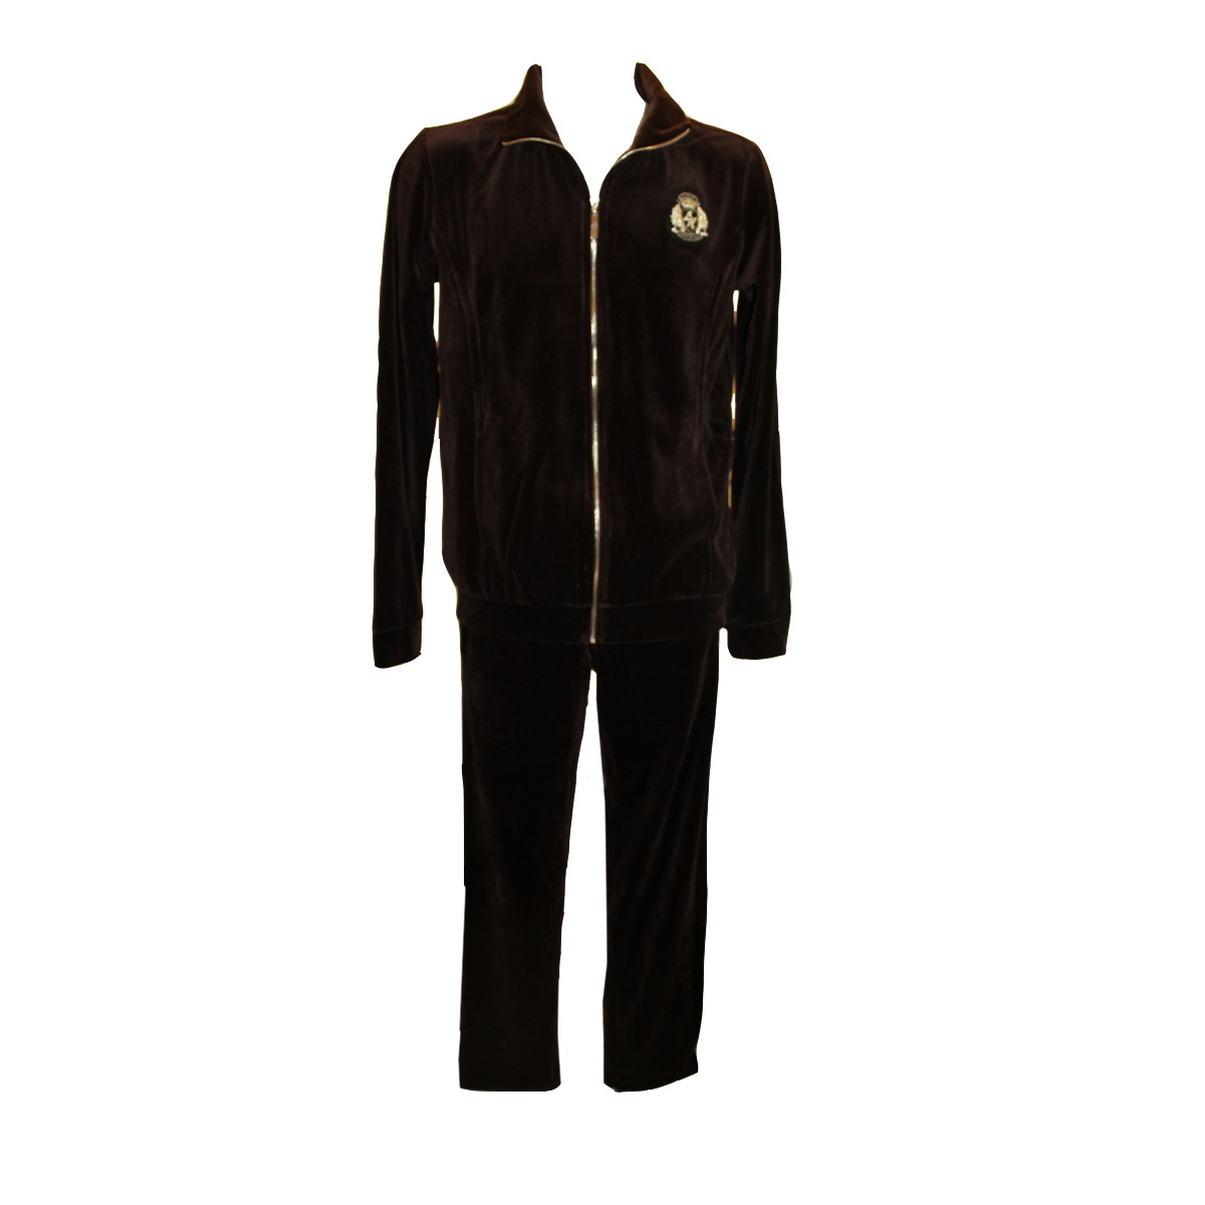 12428ec0cc298 Костюм костюм велюровый   Купить костюм велюровый   Chantal store